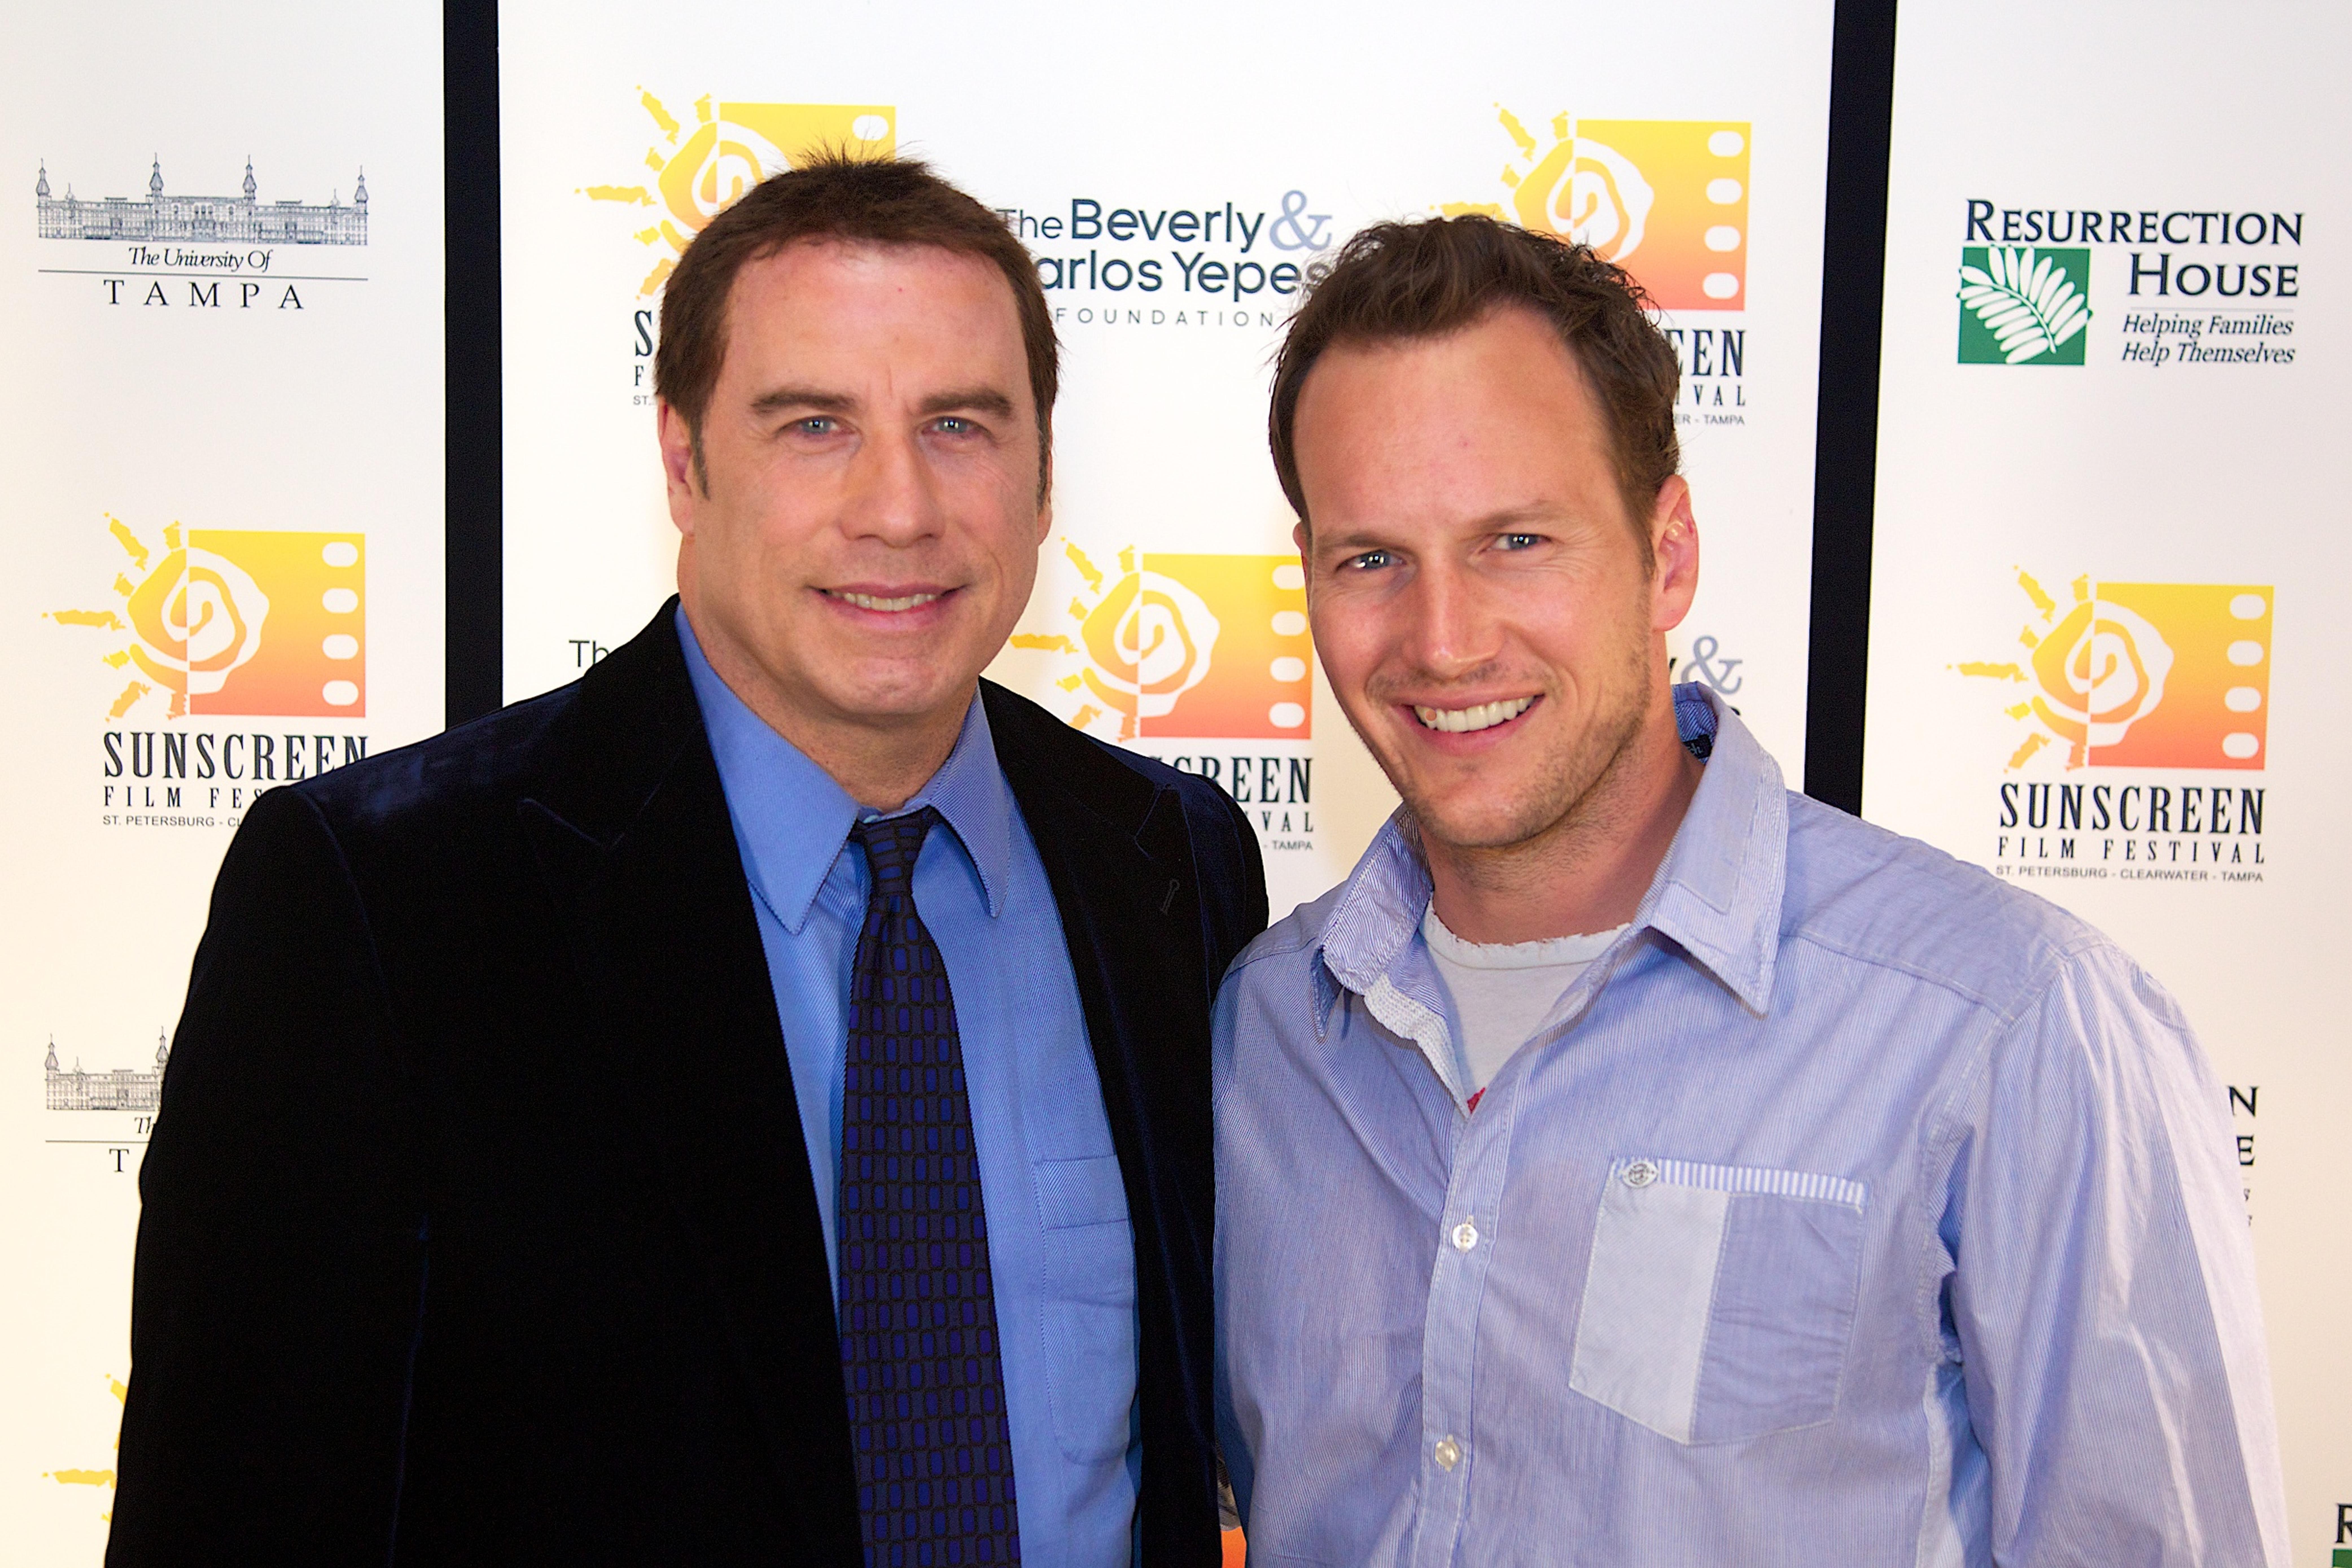 John Travolta & Patrick Wilson300dpi